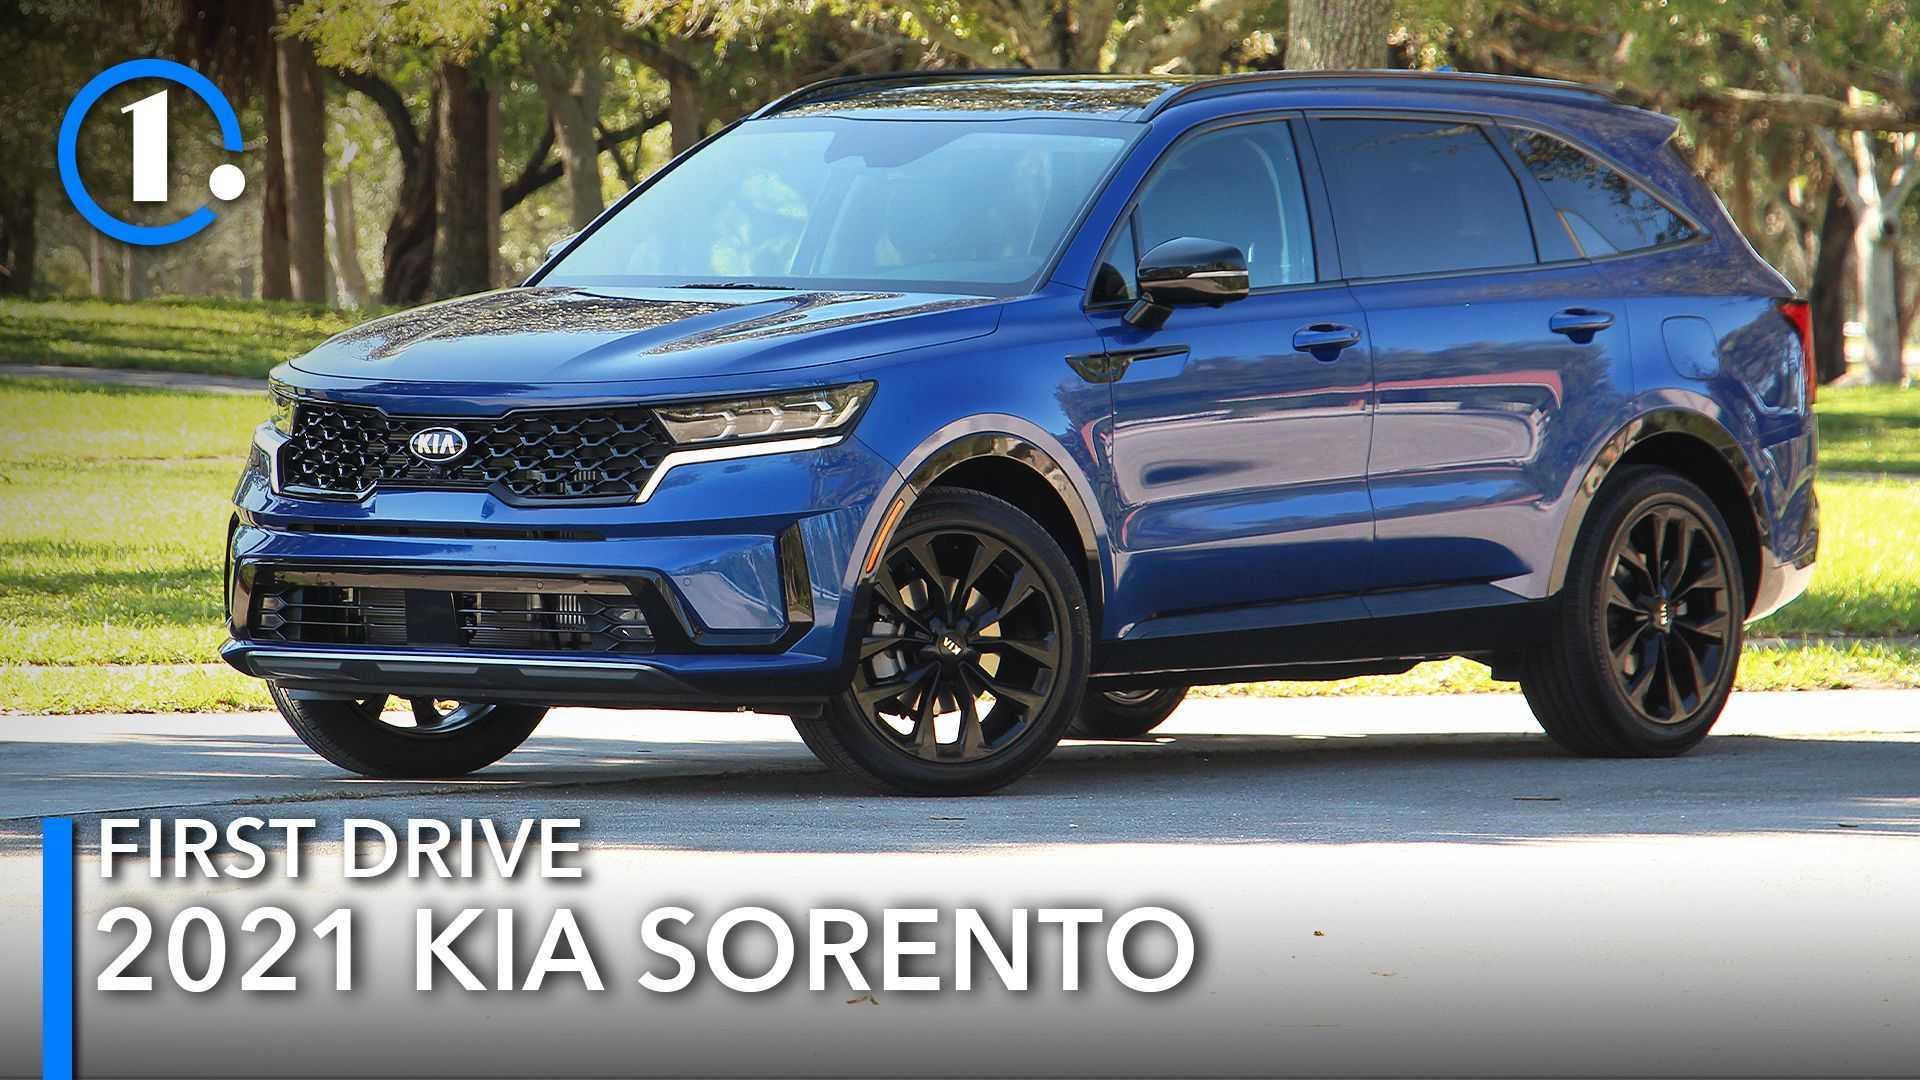 2021 Kia Sorento First Drive Review: Trickle-Down Effect